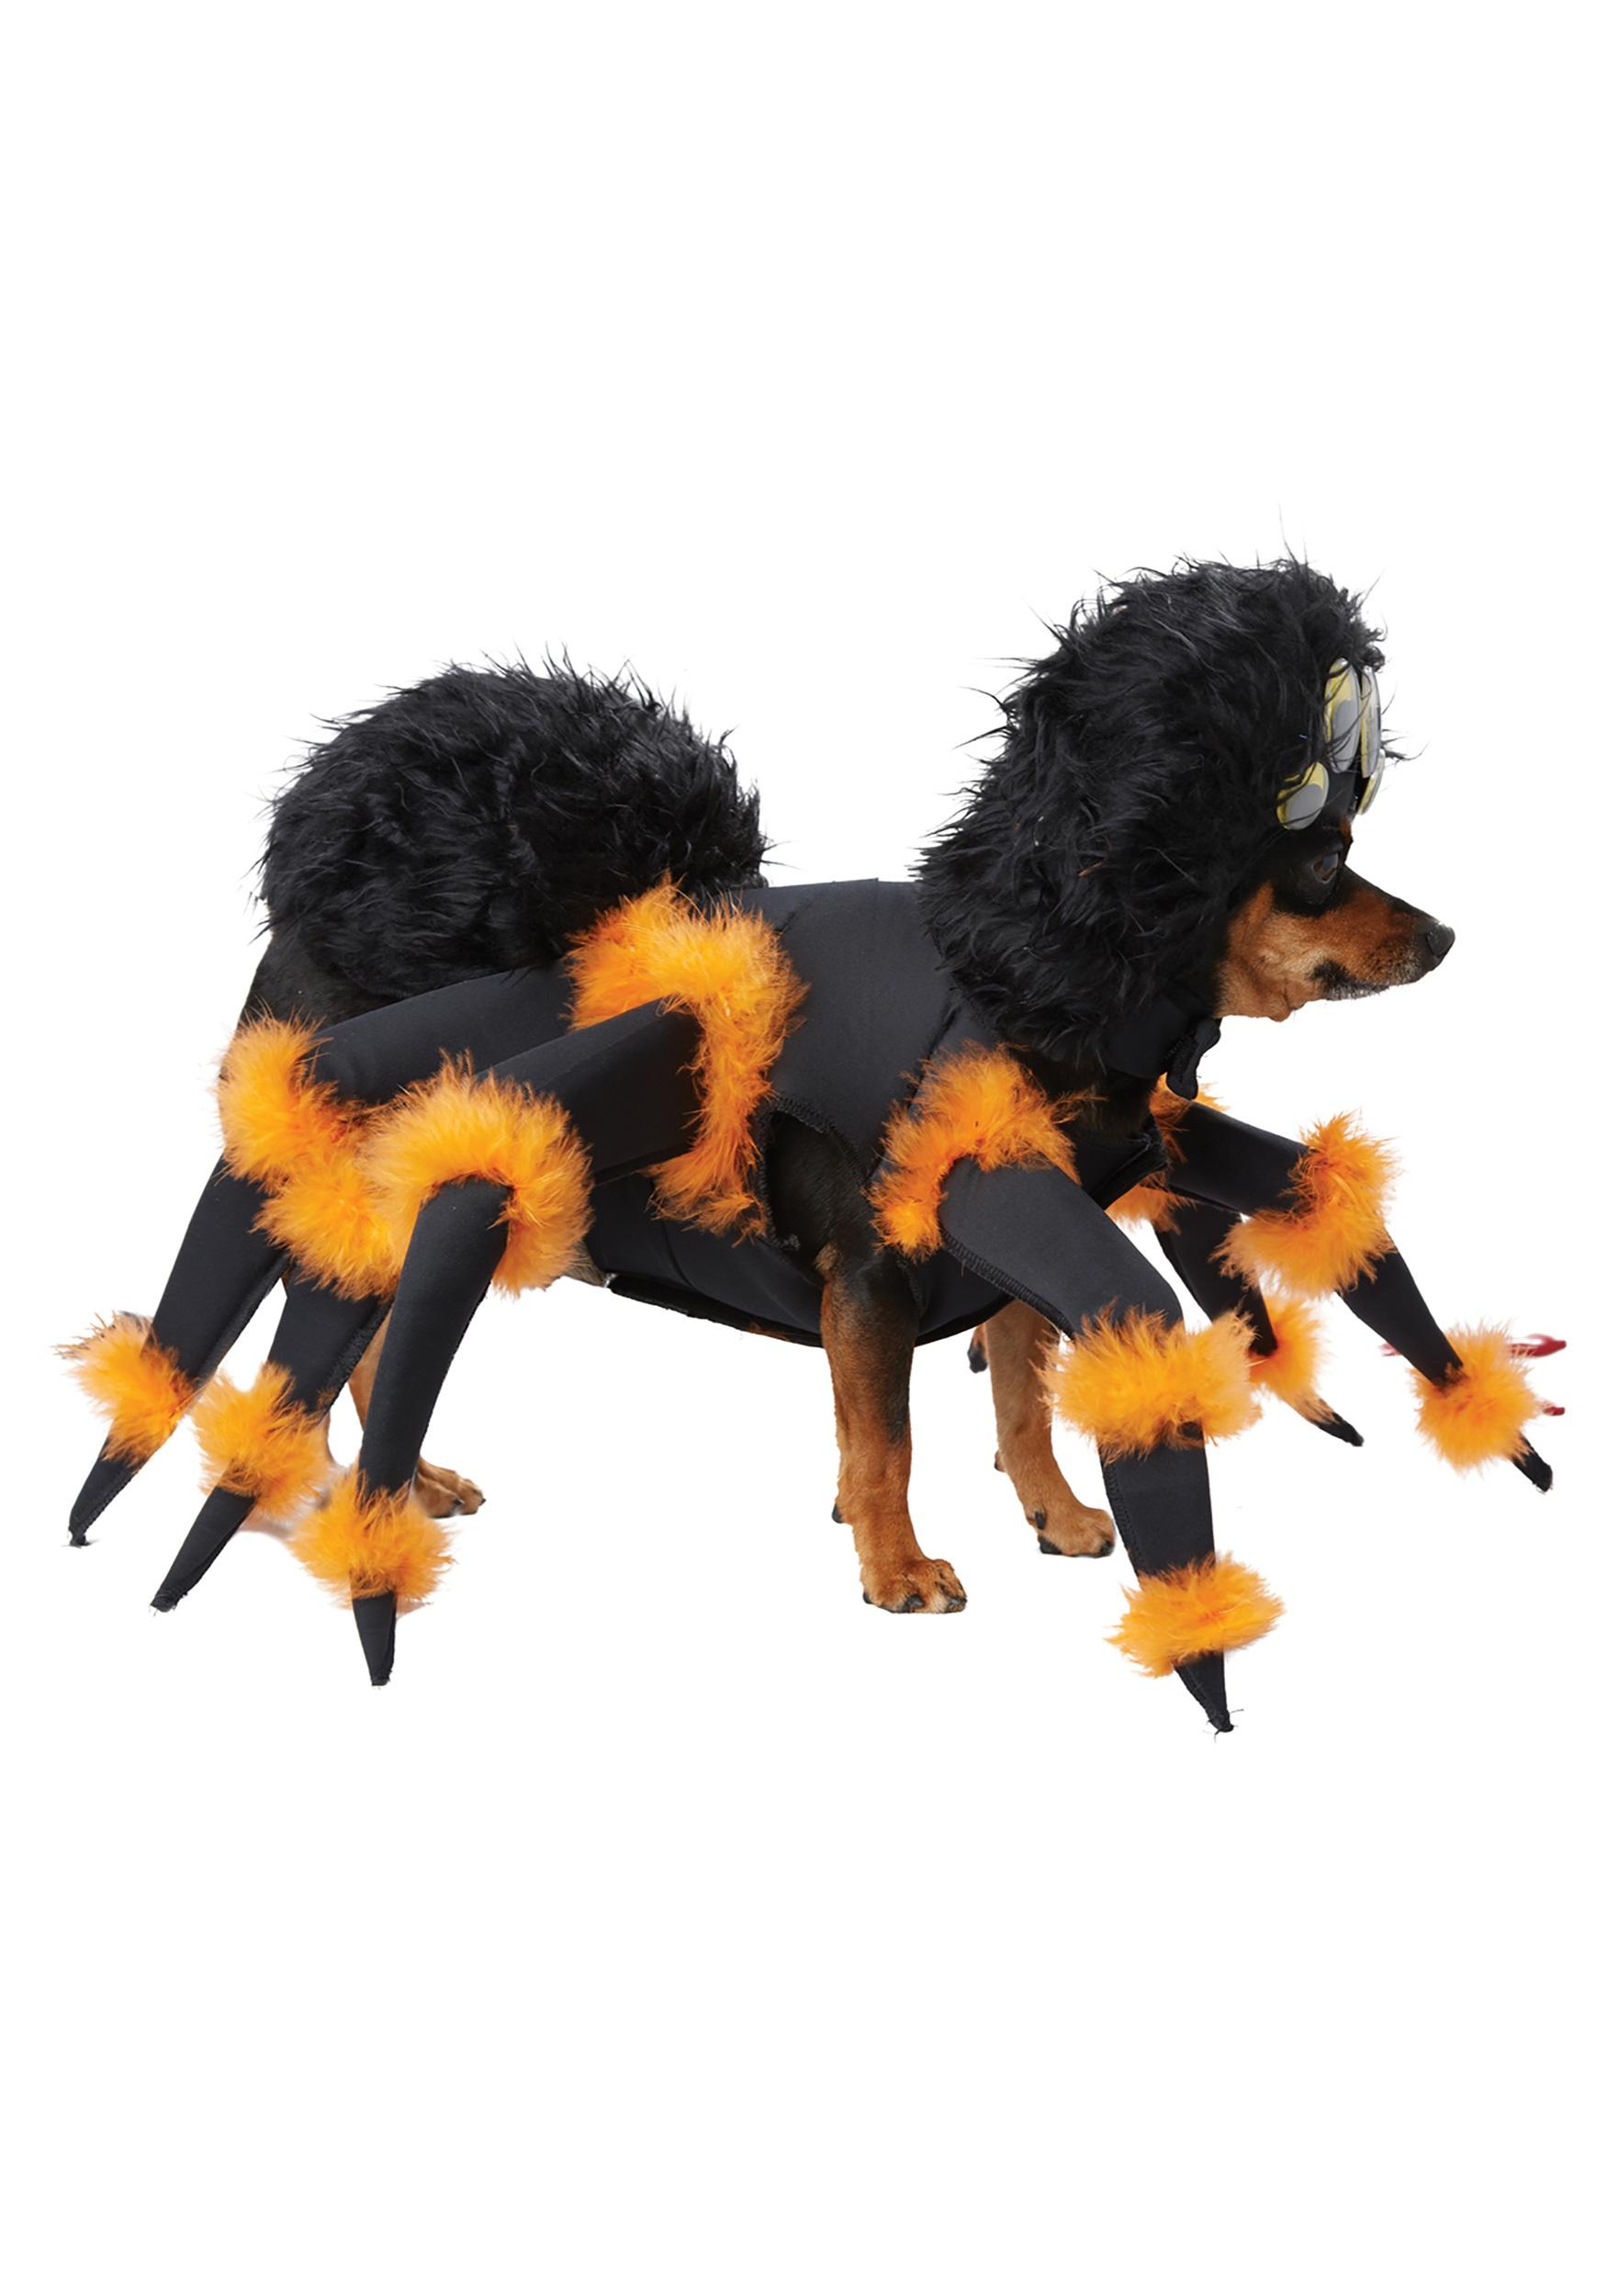 Tarantula Stuffed Animal, Giant Spider Dog Fancy Dress Creepy Tarantula Plush Deluxe Pet Halloween Costume